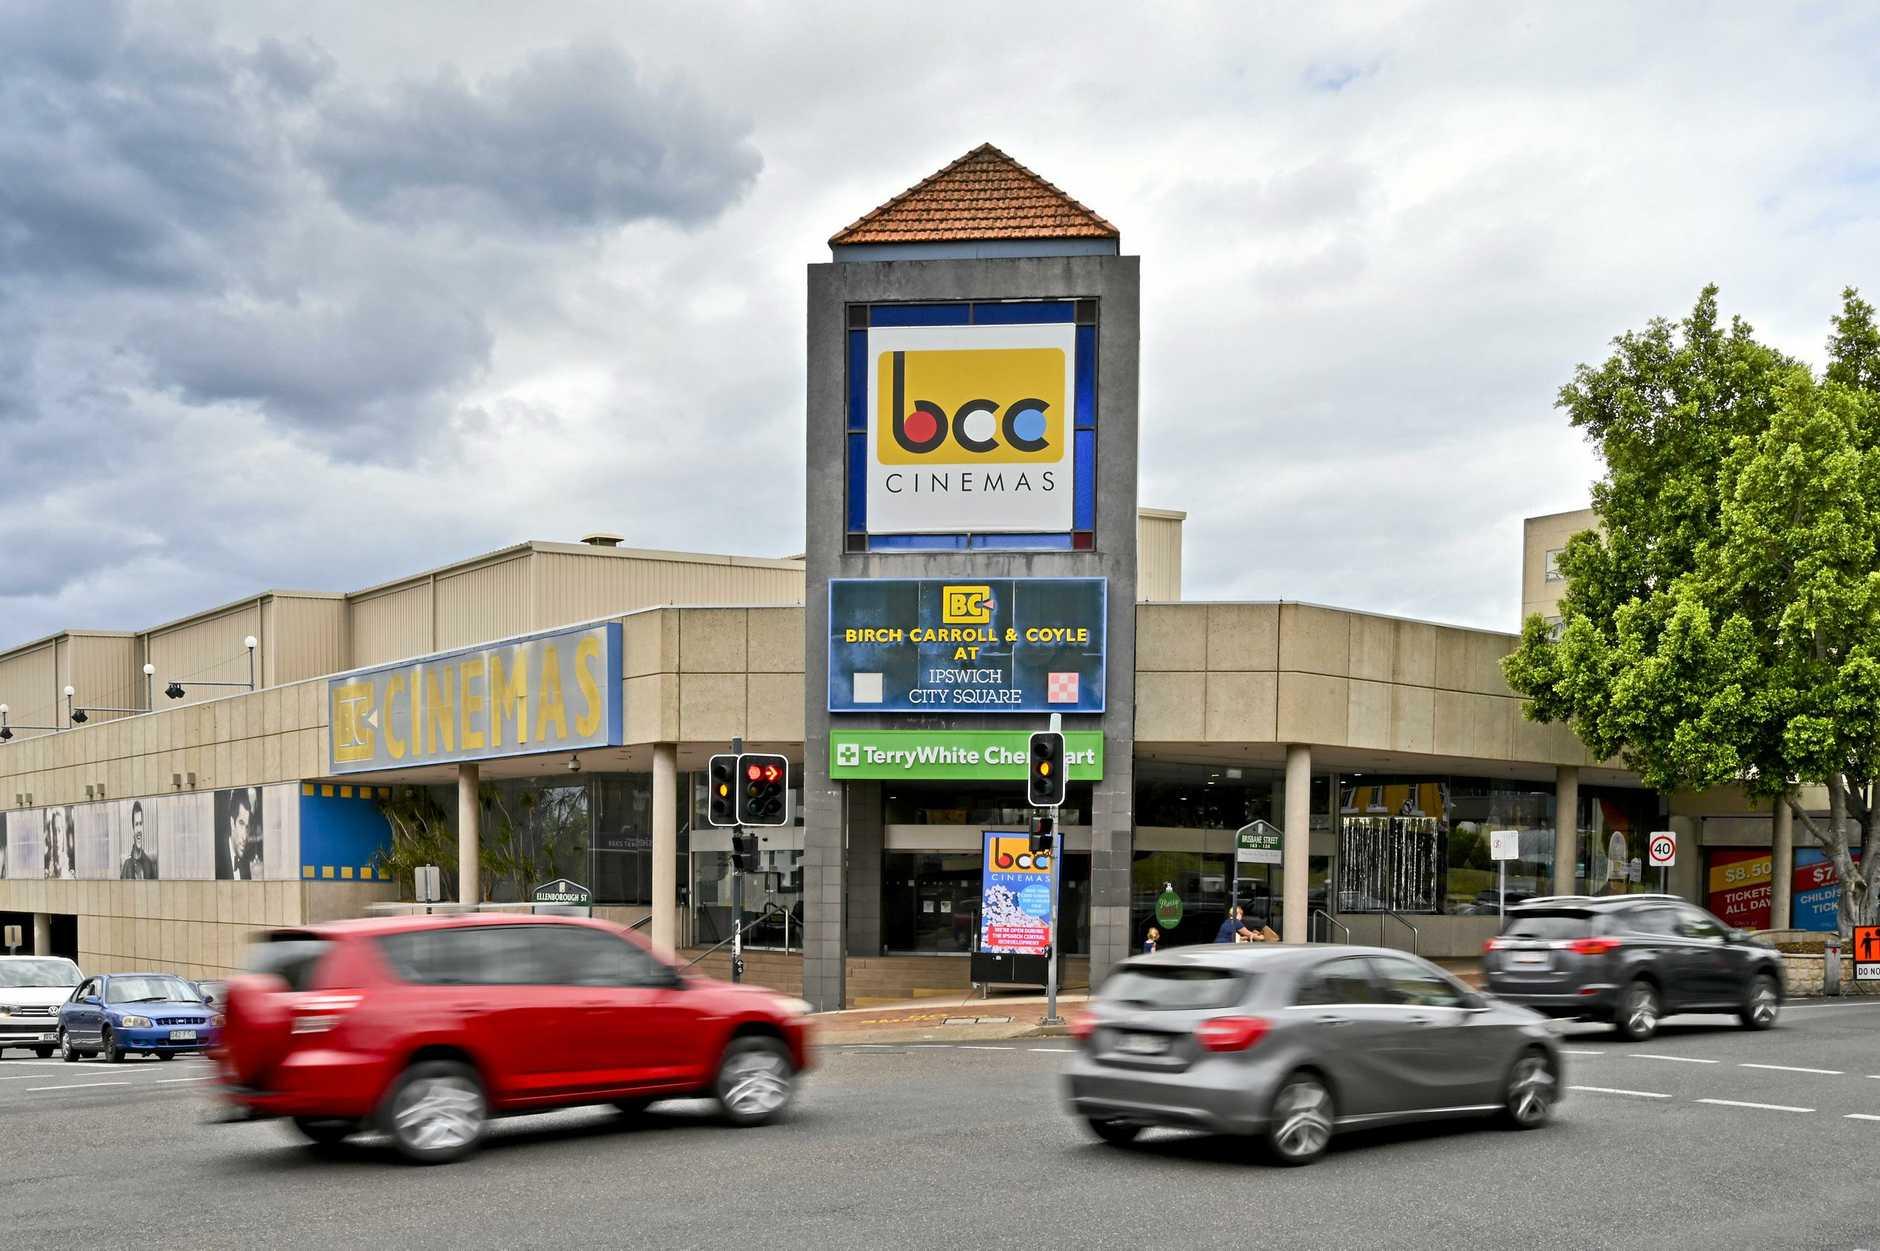 BCC Cinema Ipswich.